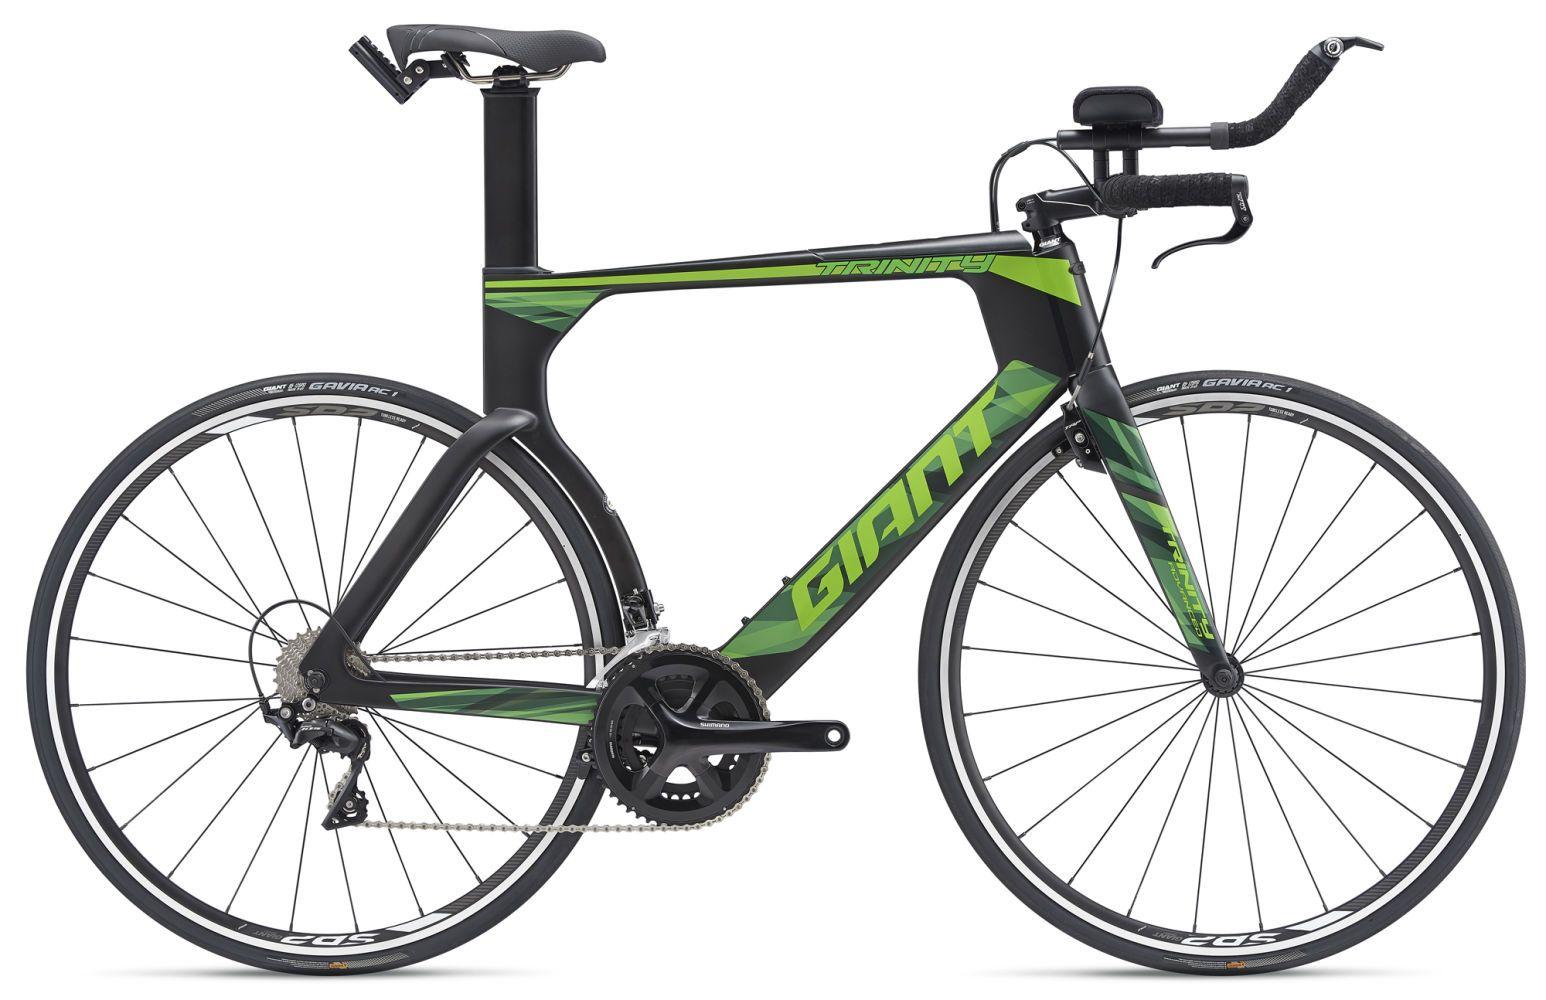 Giant Trinity Advanced Triathlon Road Bike 2019 1795